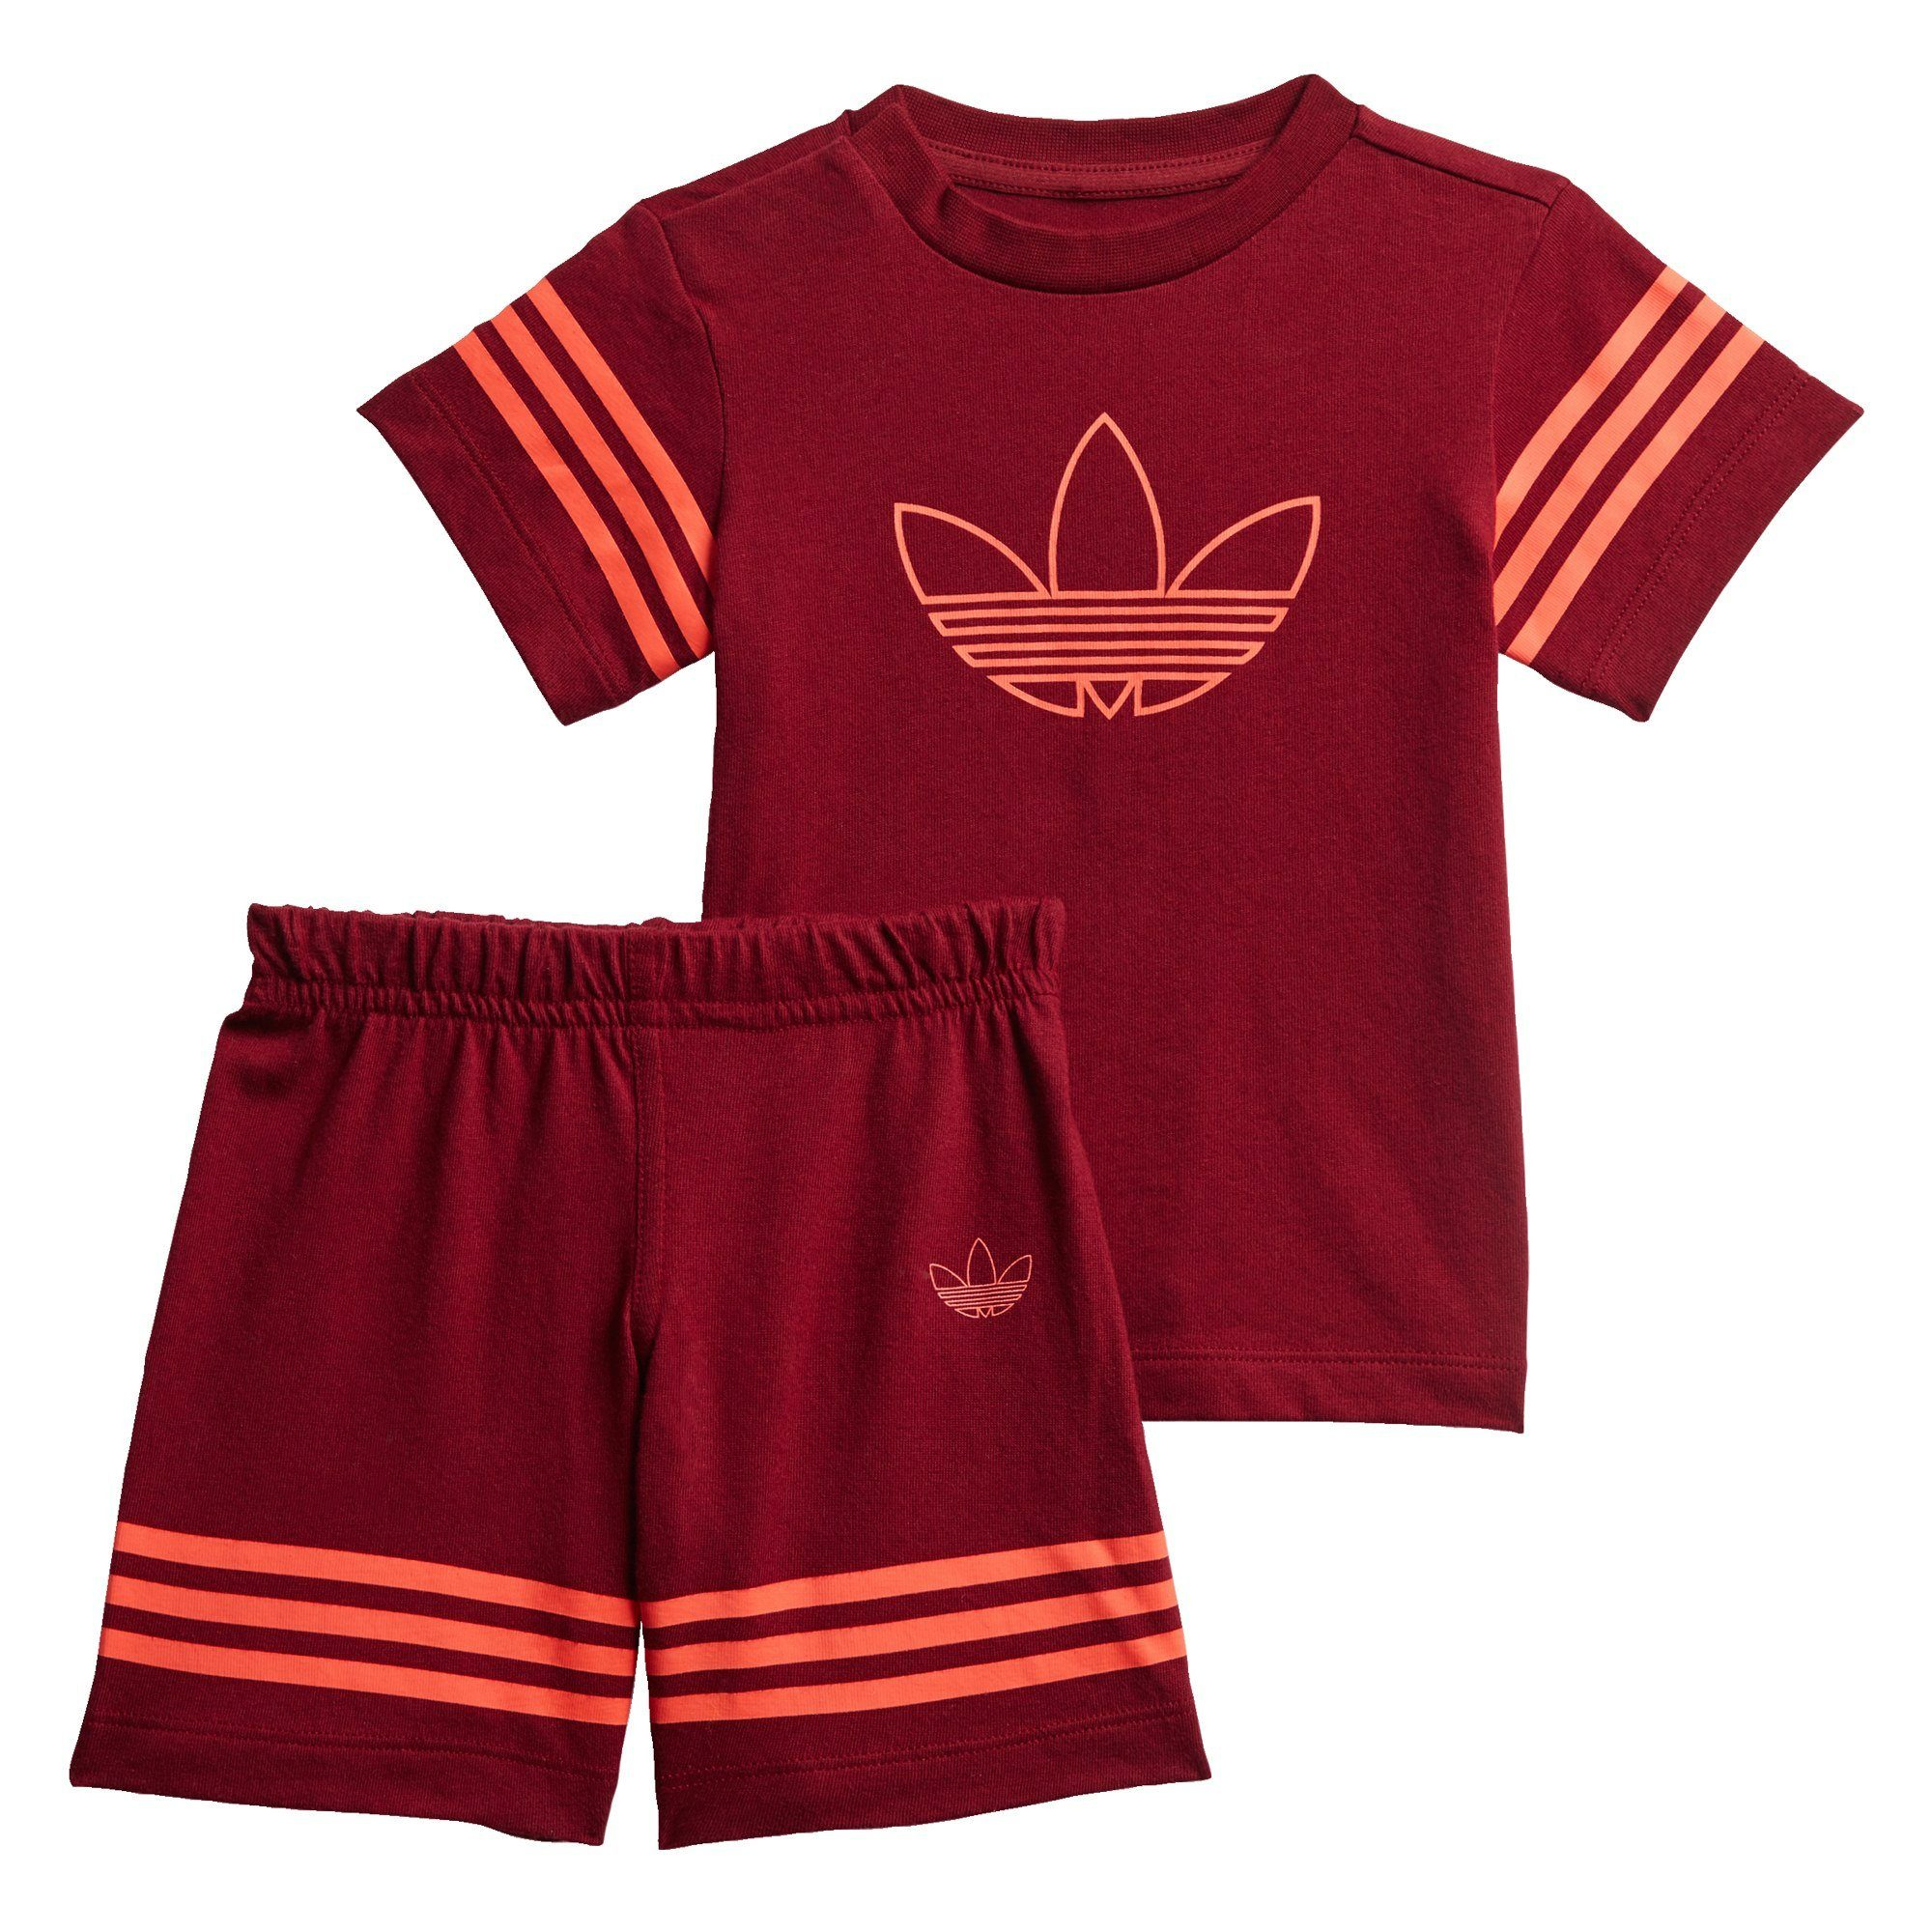 Unisex adidas Originals Trainingsanzug »Outline Shorts und T-Shirt Set«    04062054721108